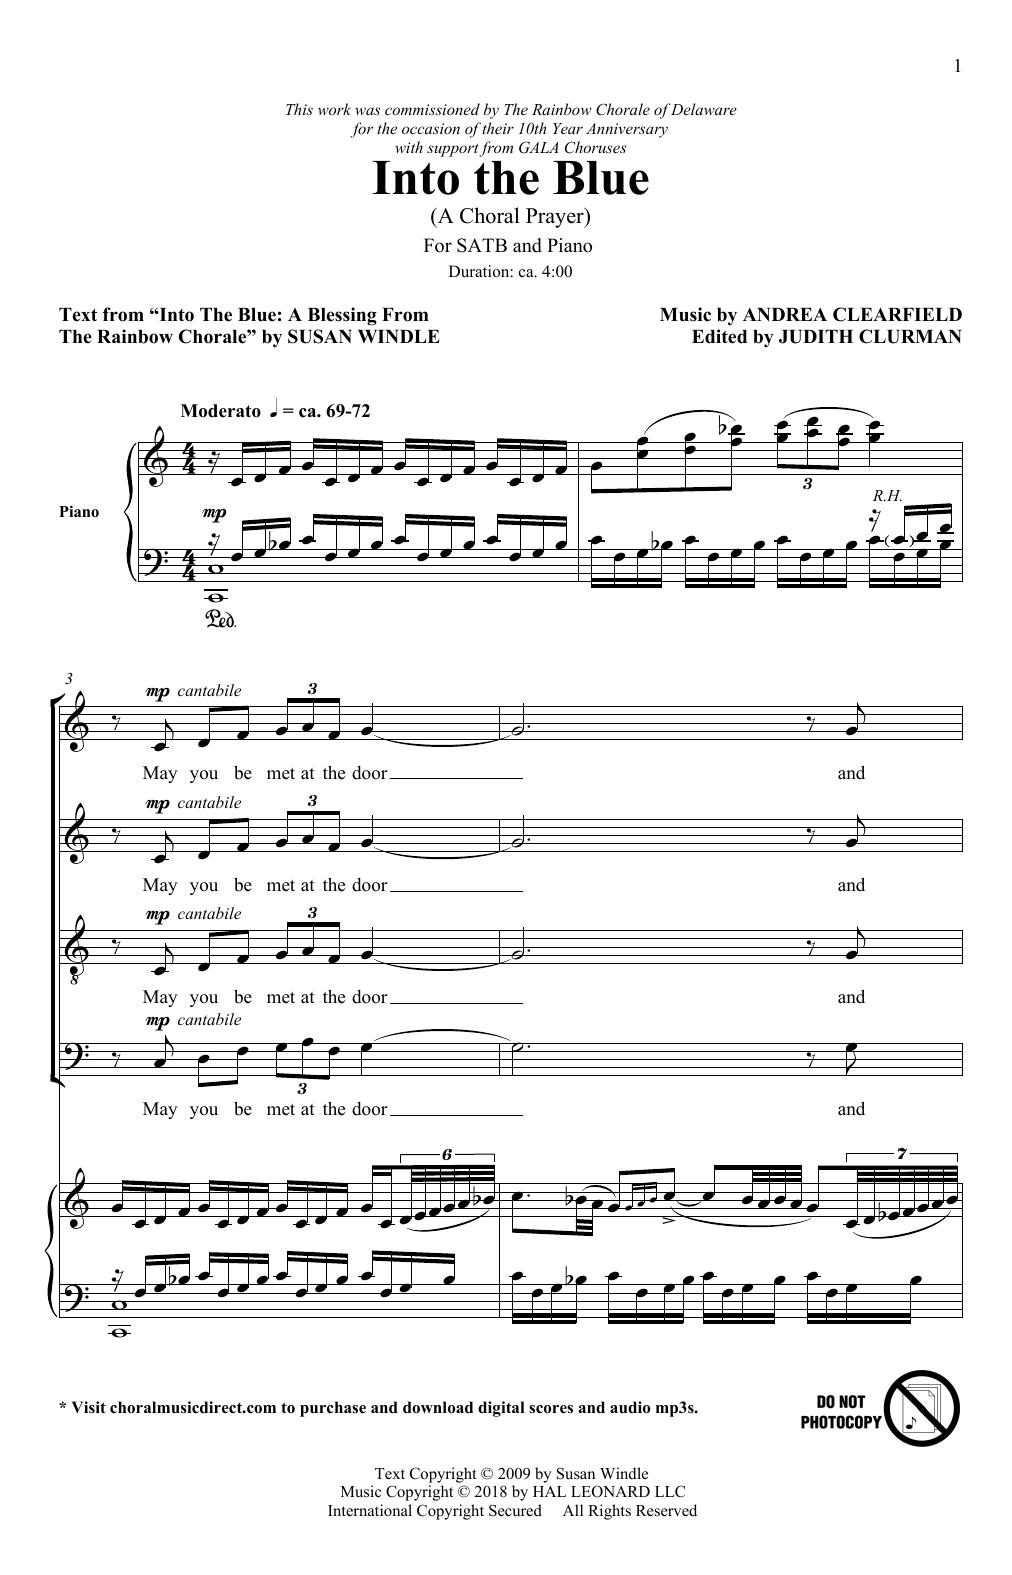 Into The Blue: A Choral Prayer (SATB Choir)